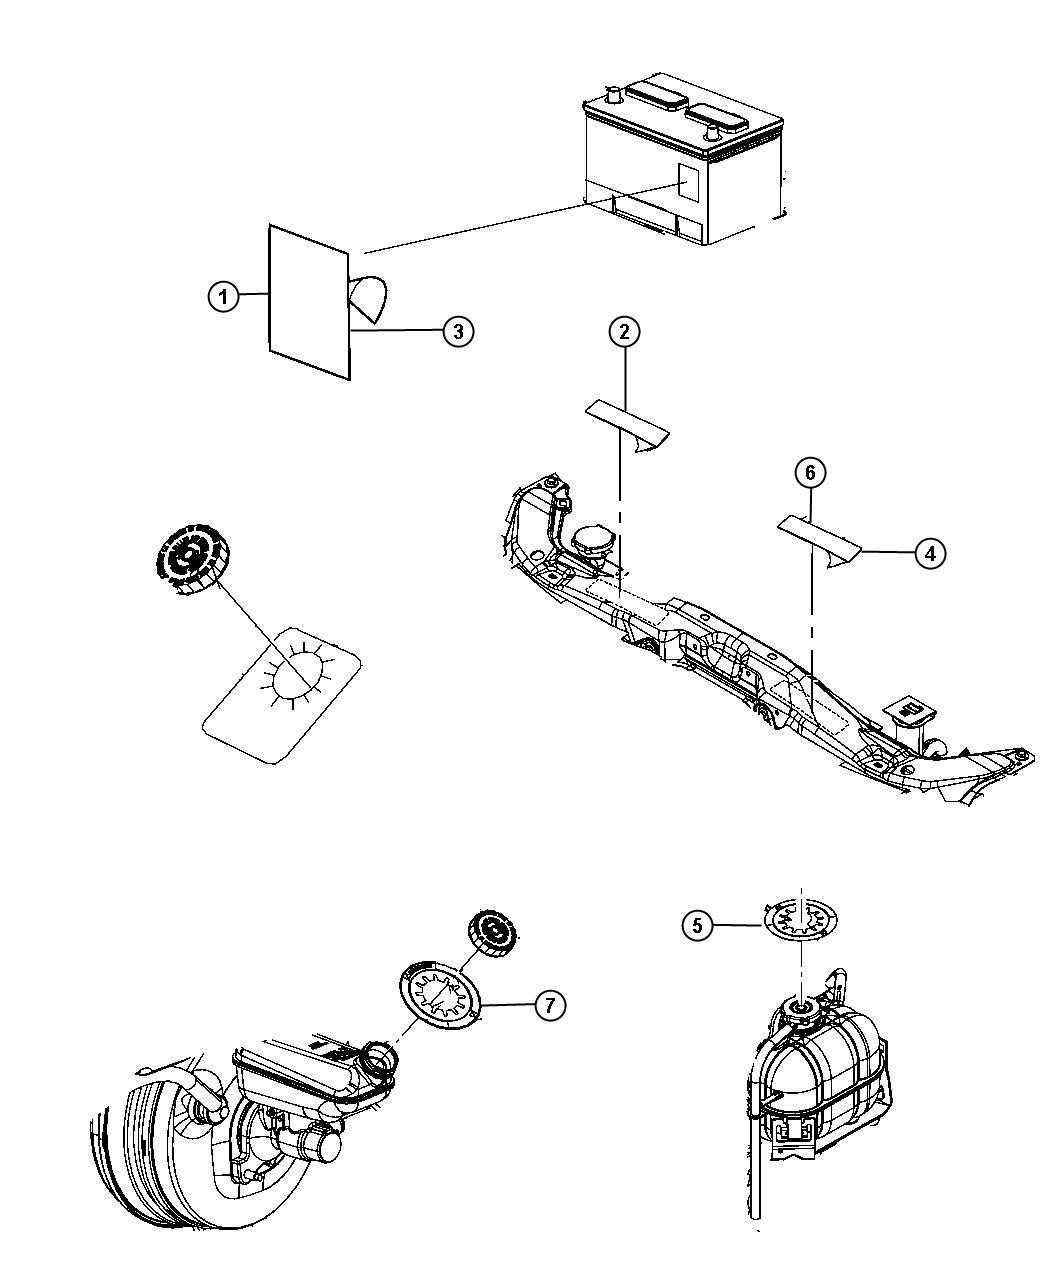 Dodge Nitro Label  Air Conditioning System  Refrigerant